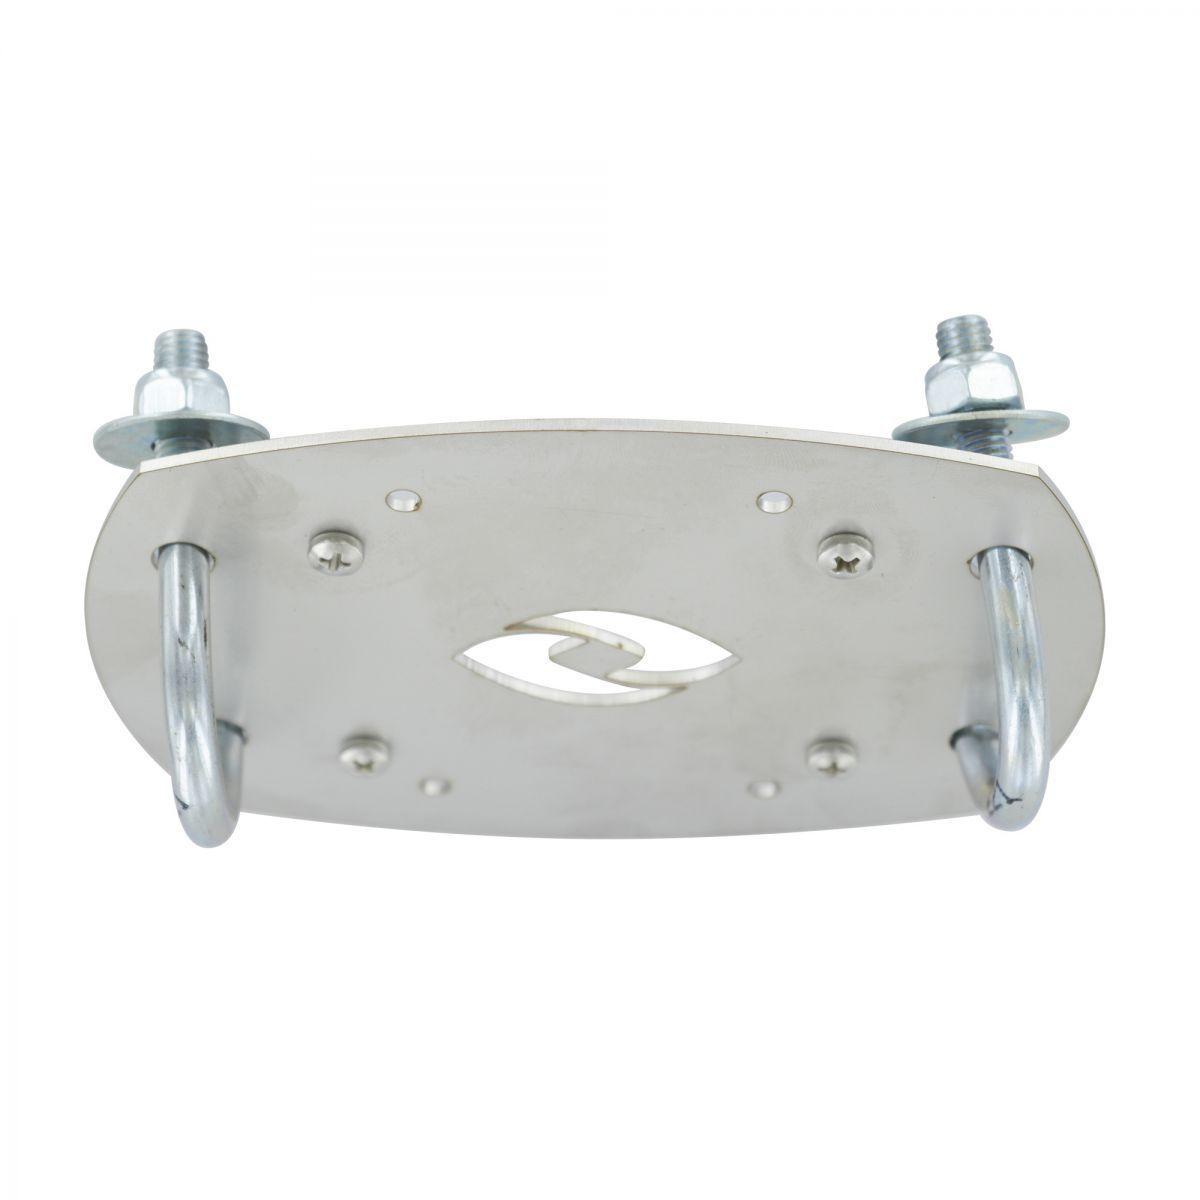 mounting bracket sendzimir 2 mm fits for controlpanel smartpanel